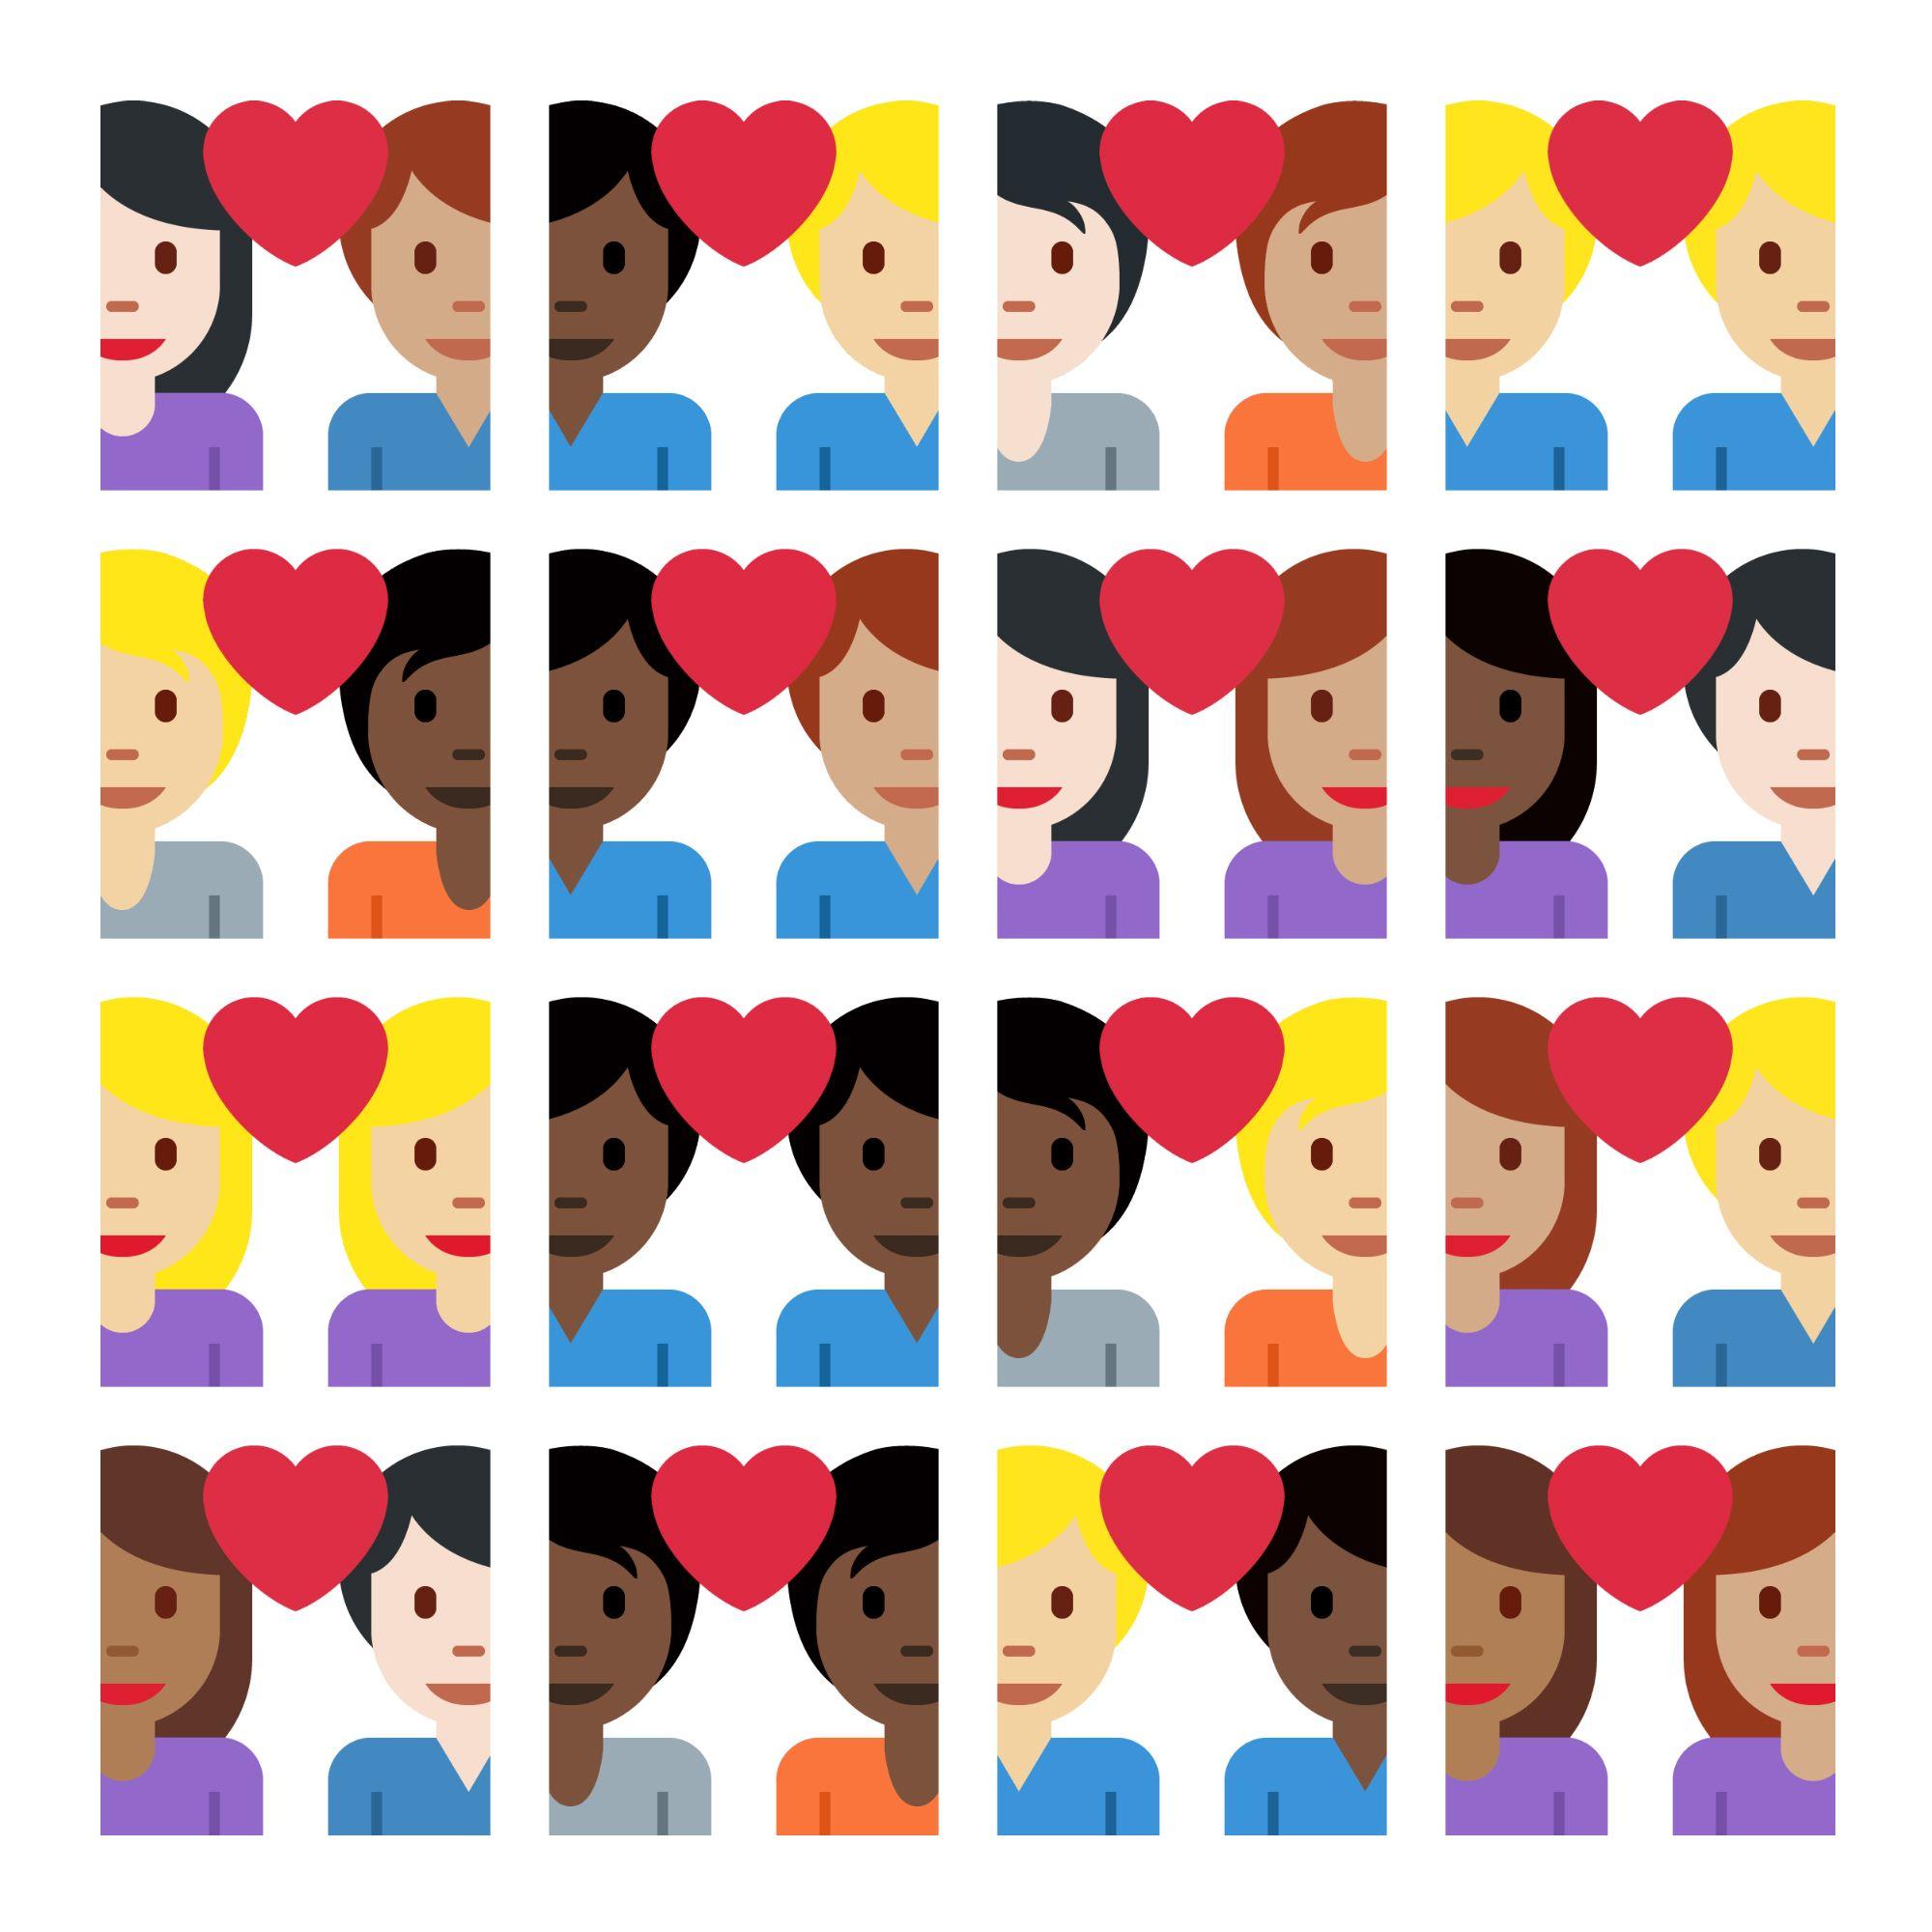 Emojipedia-Twemoji-13_1-New-Couples-Emojis